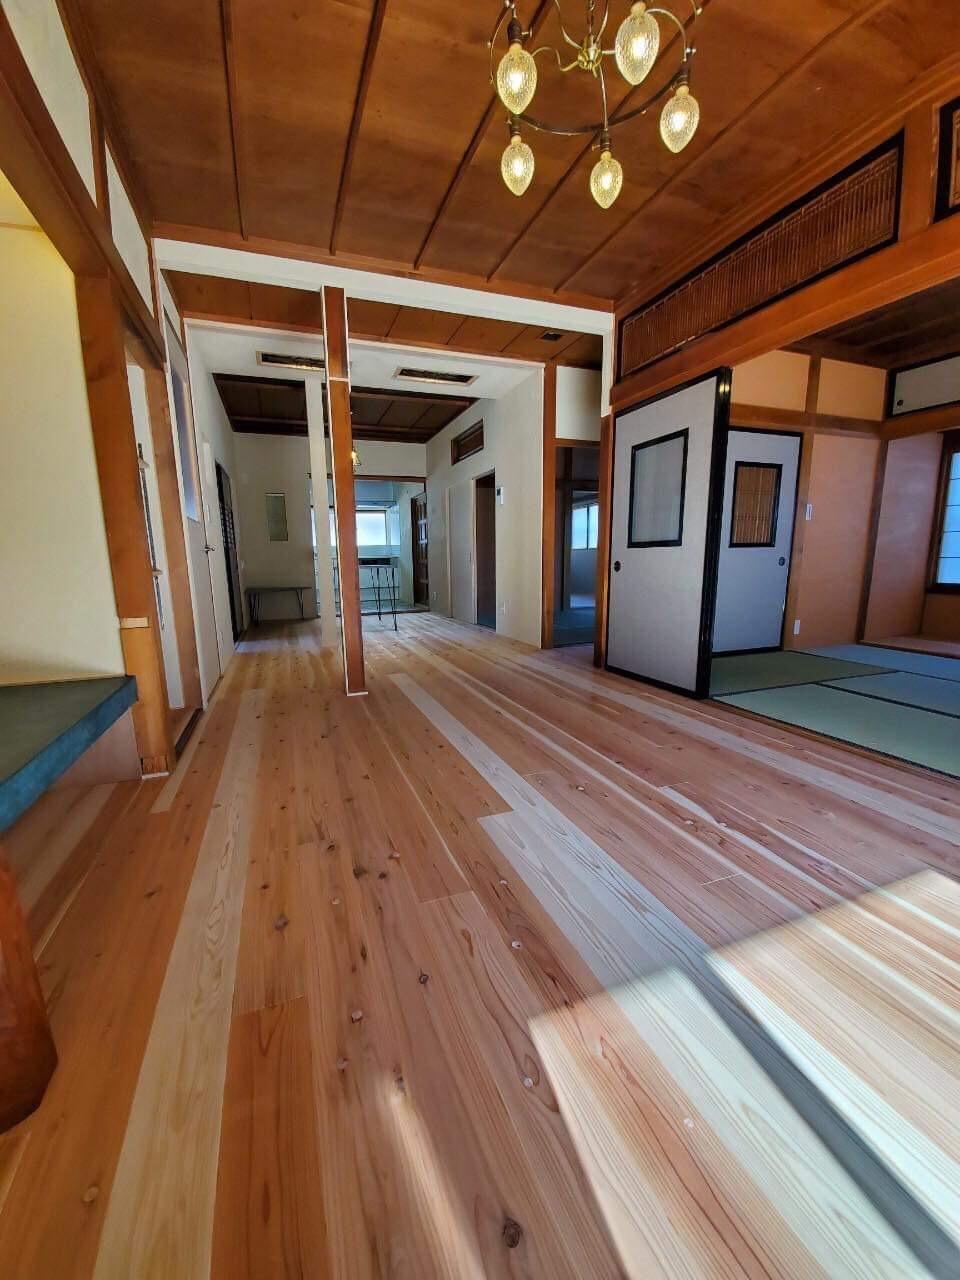 VR画像あり♪【リノベーション住宅】島田市向谷3丁目 内覧のご予約随時受付中!!